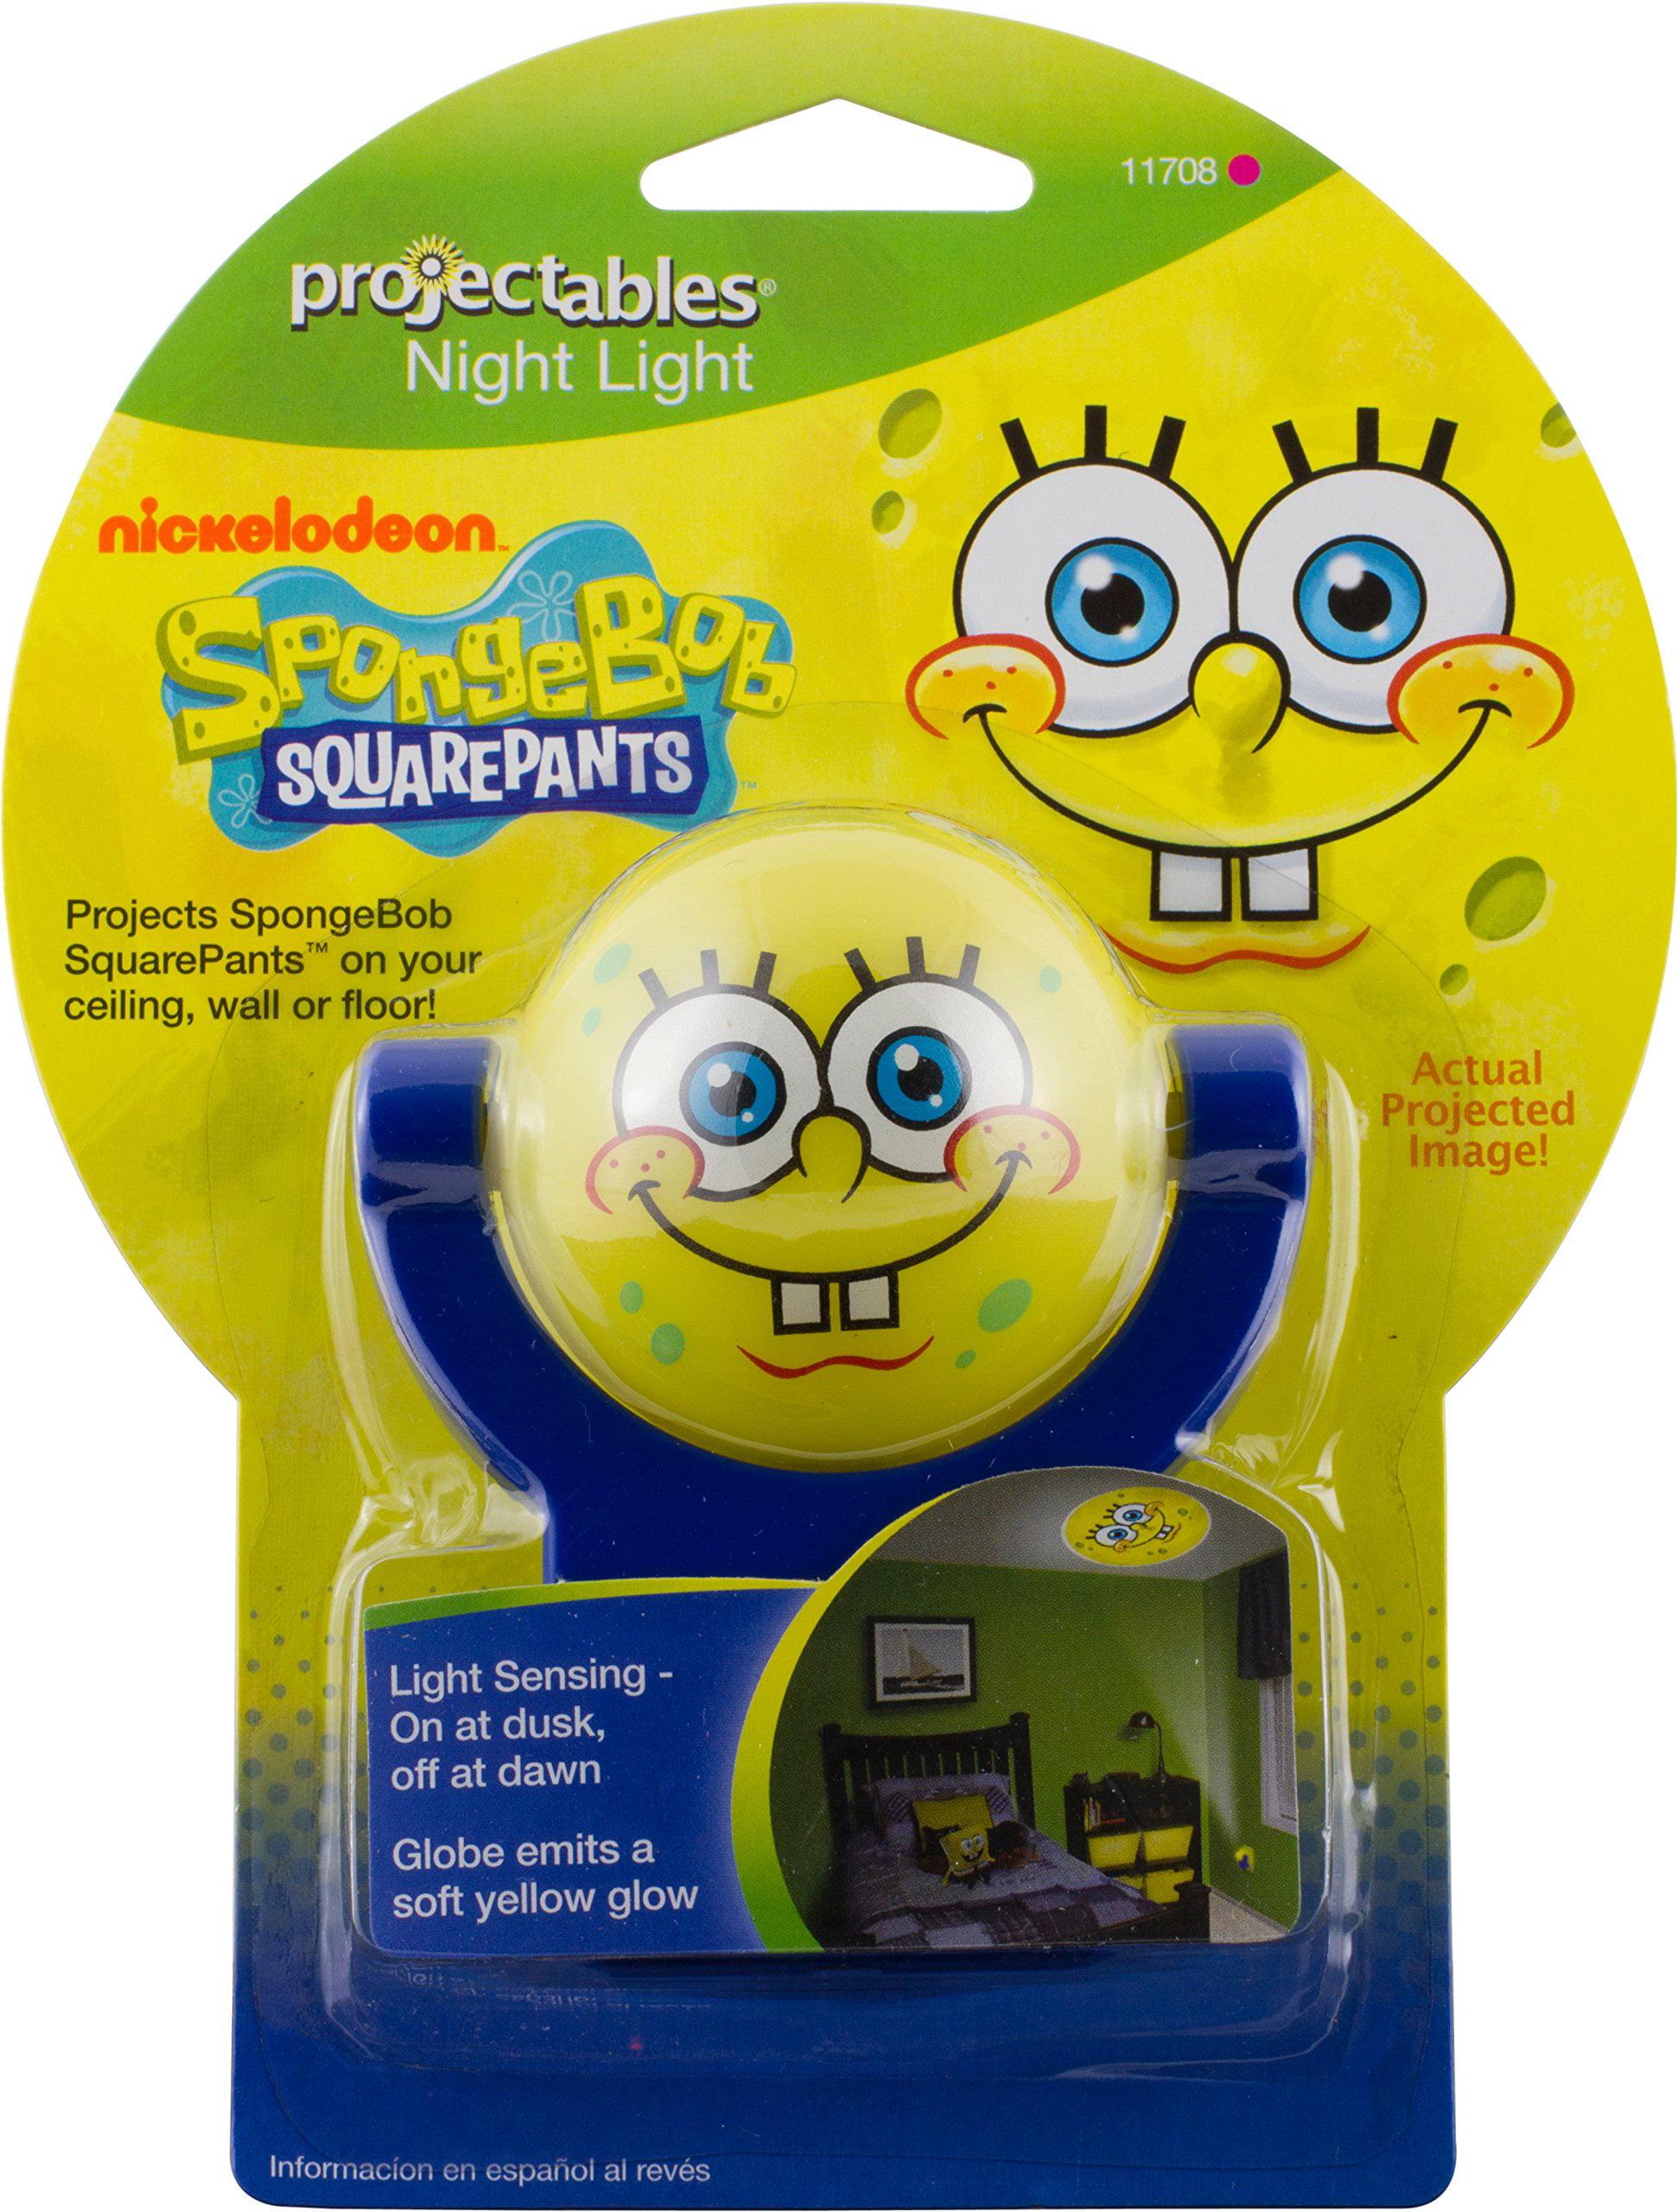 Projectables LED Plug-In Night Light, SpongeBob SquarePants by Jasco